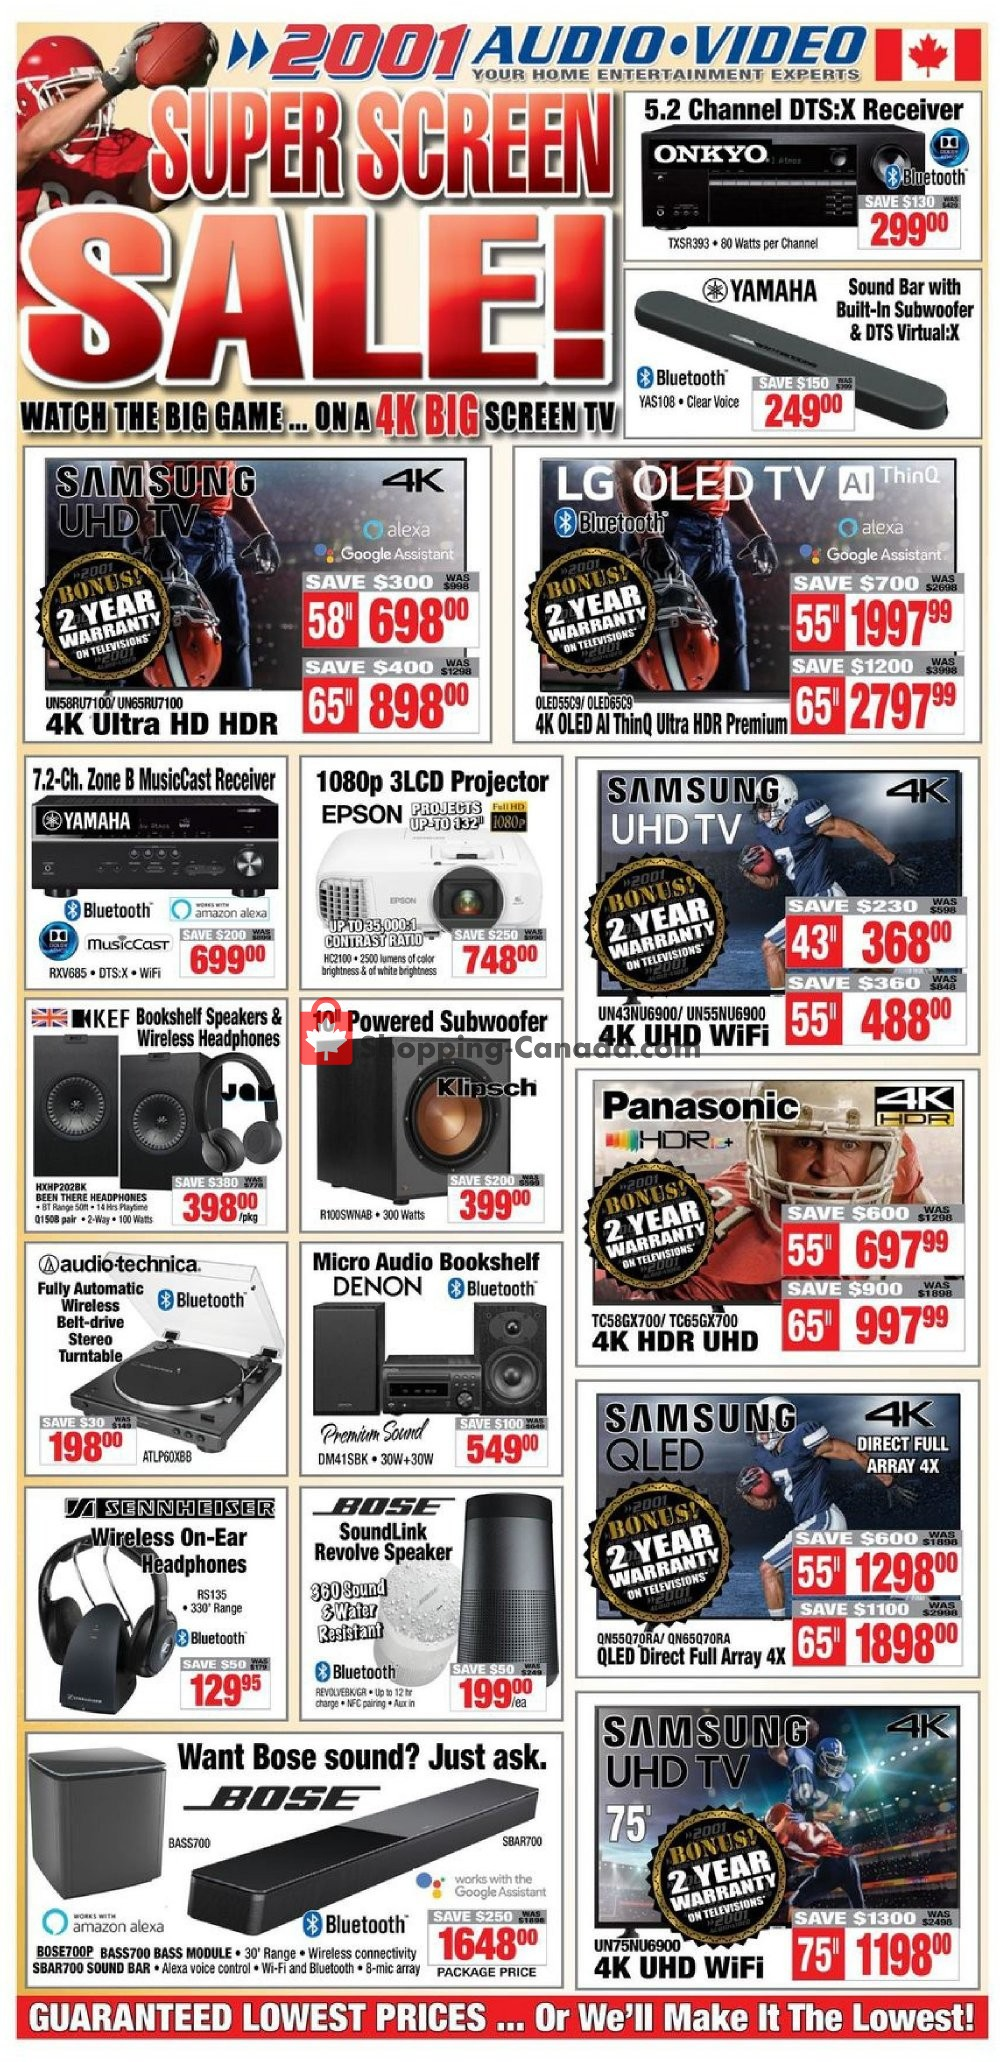 Flyer 2001 Audio Video Canada - from Friday January 31, 2020 to Thursday February 6, 2020